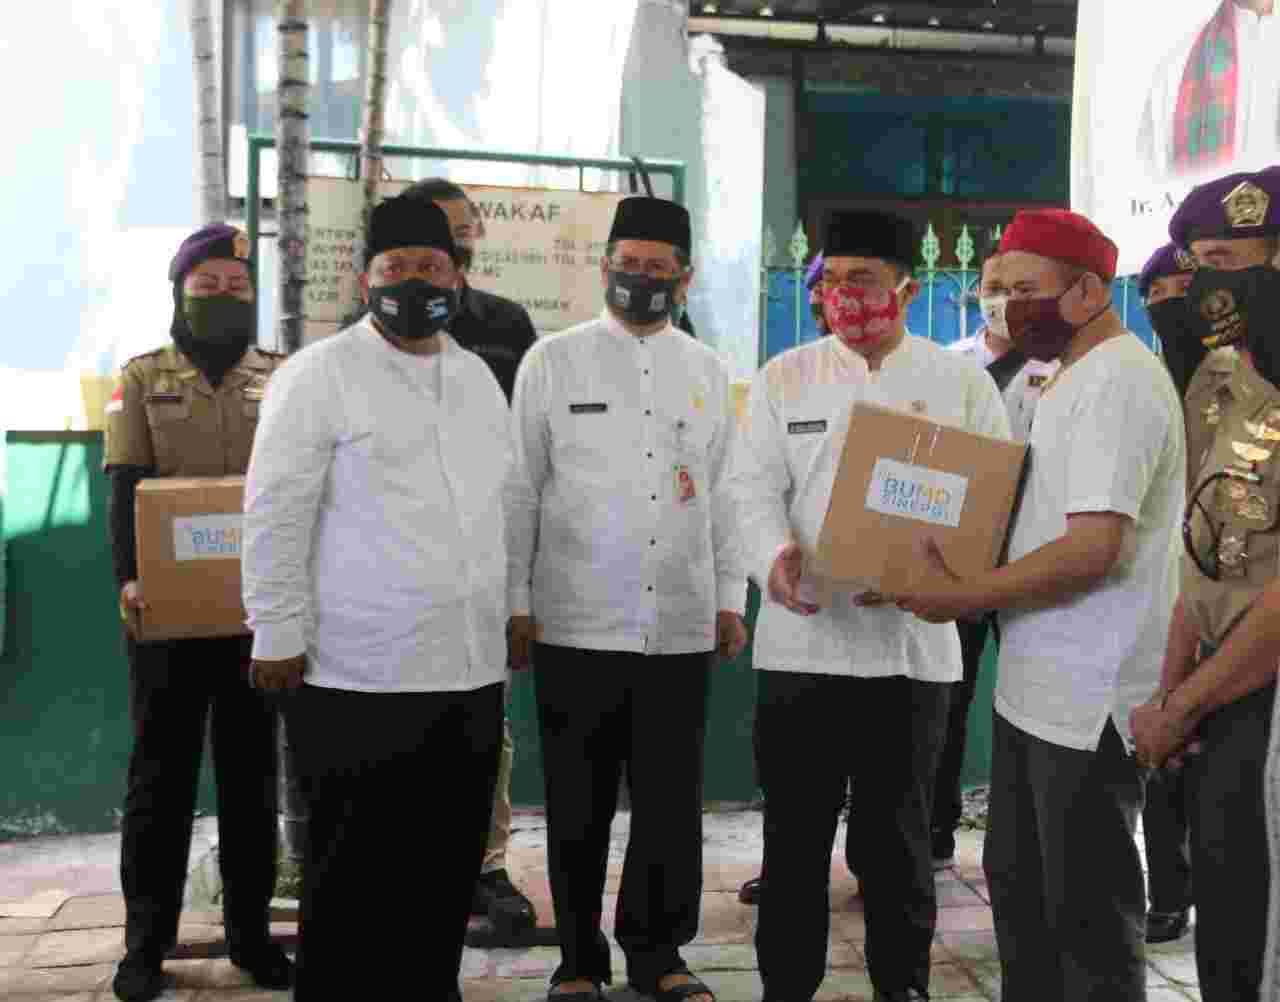 Kolaborasi BUMD, Wagub Ariza Bagikan Paket Bansos Untuk Pendonor Darah